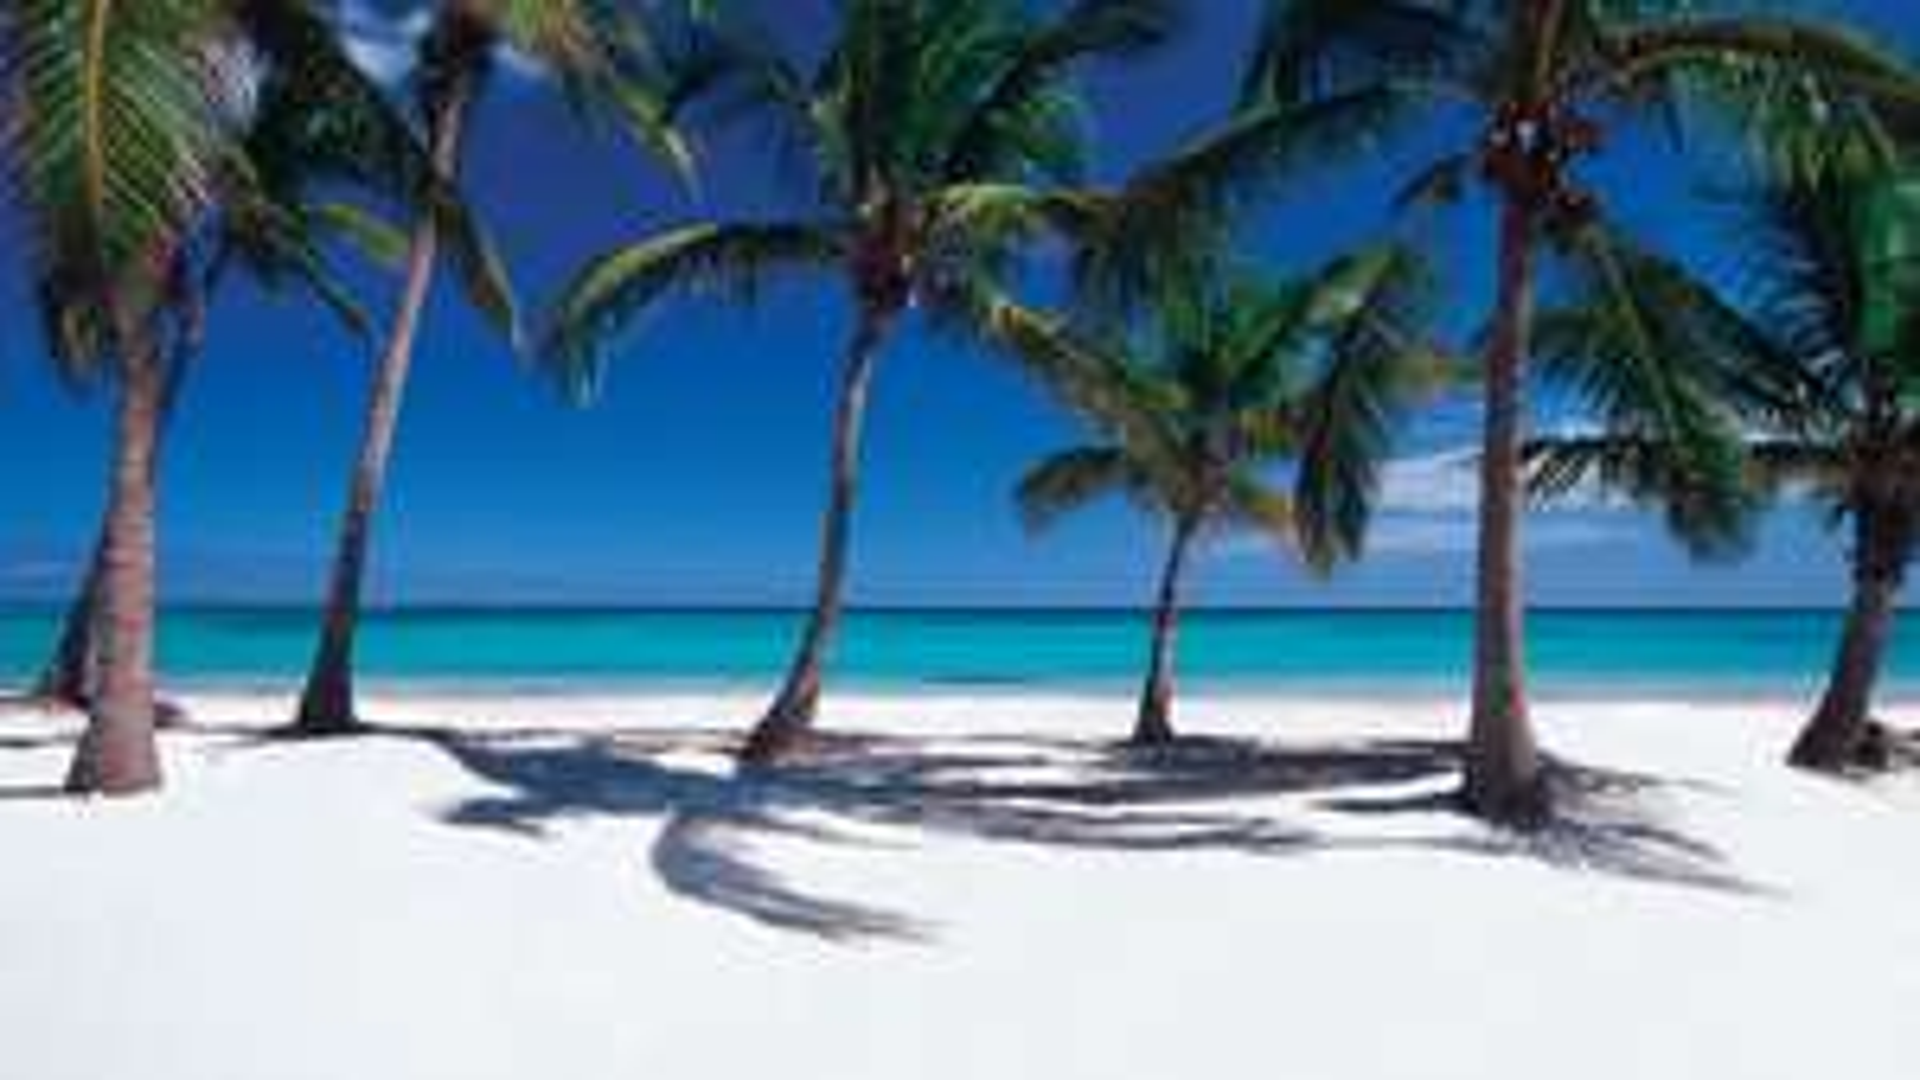 Karibik: mit Eurowings JAN/FEB von Köln/Bonn/ nach Punta Cana 228€ / Cancun/Mexico 228€ / Varadero/Kuba 253€